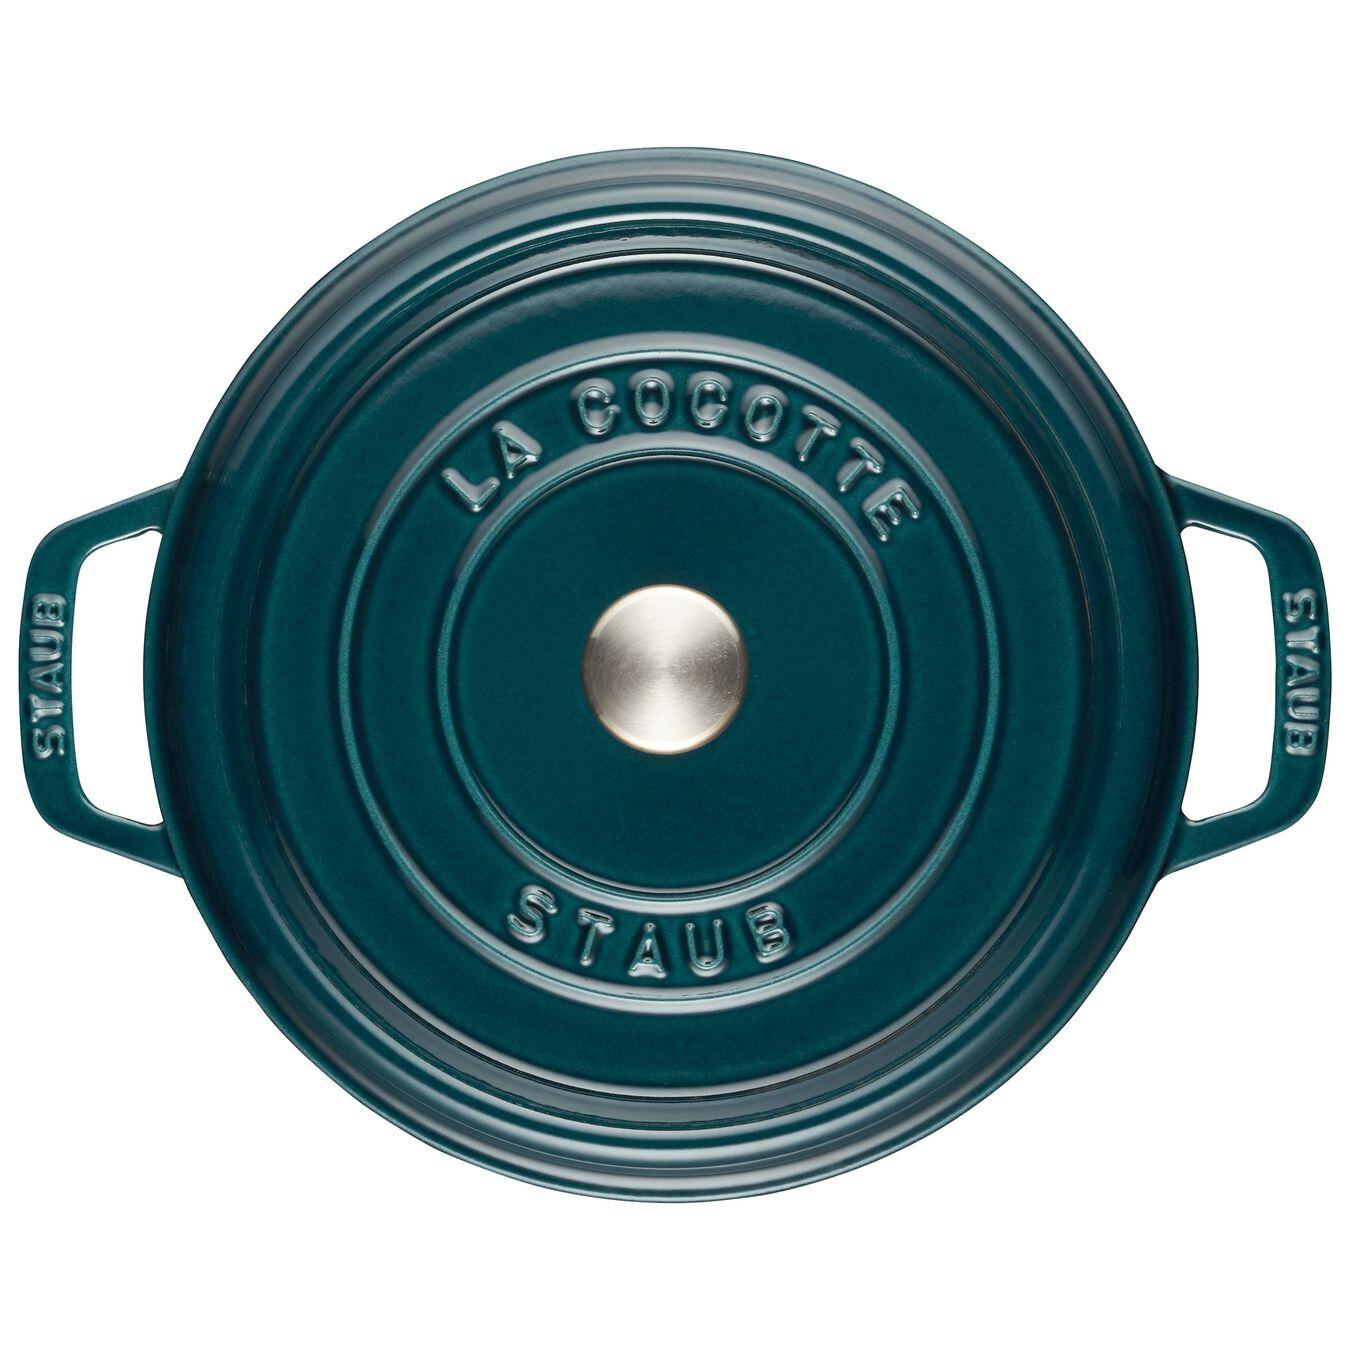 Döküm Tencere | Döküm Demir | 3,8 l | Akdeniz Mavisi,,large 4